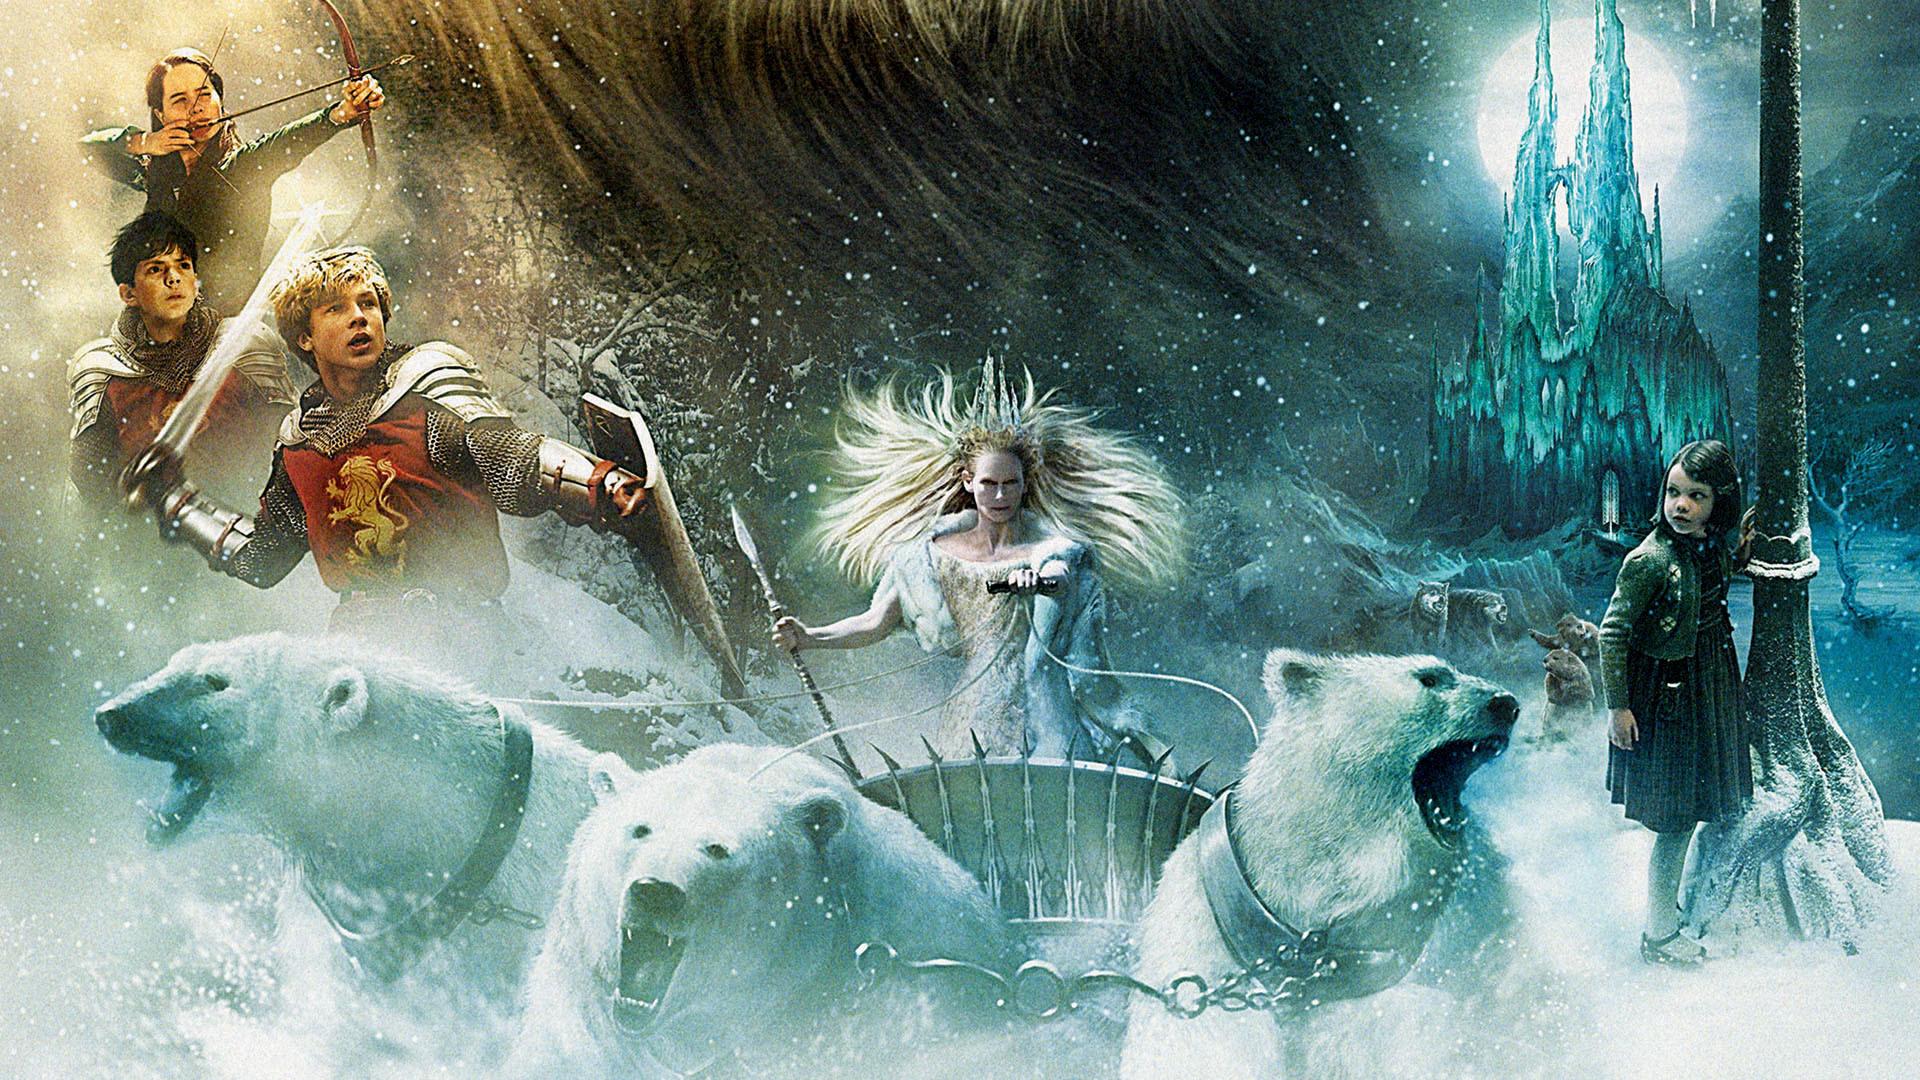 Narnia Aslan Wallpaper 68 images 1920x1080